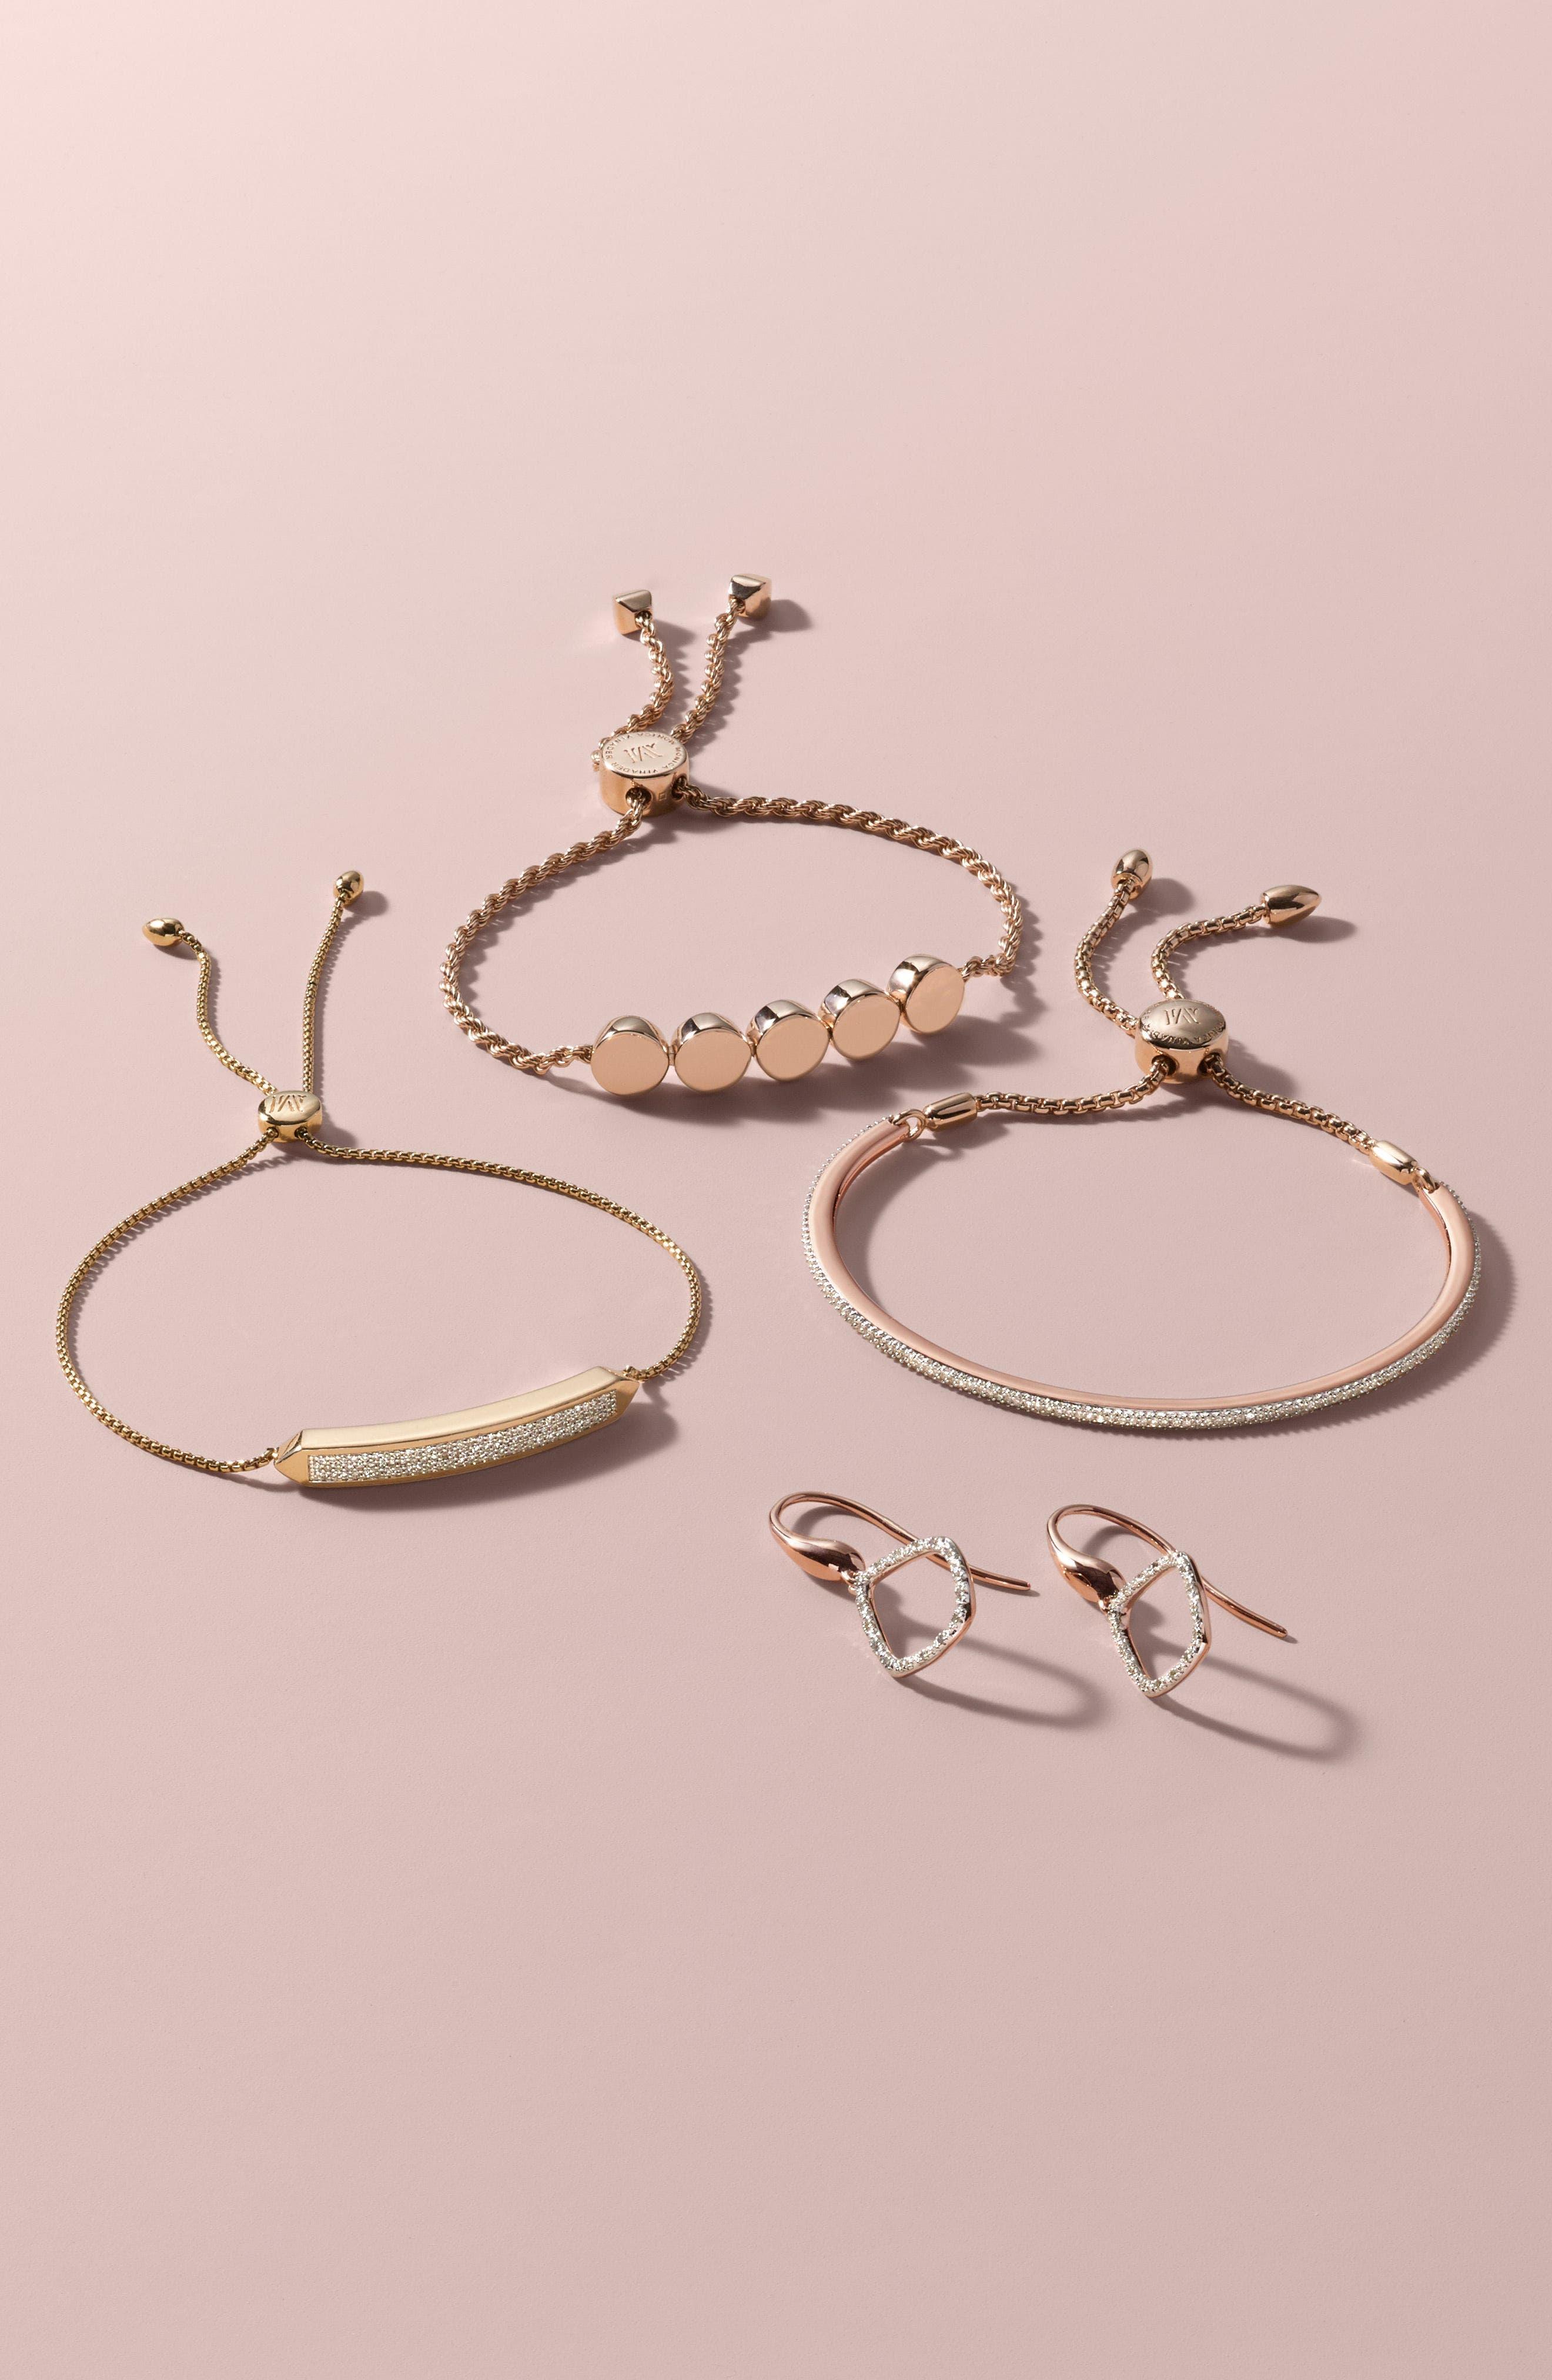 Baja Skinny Pavé Diamond Bracelet,                             Alternate thumbnail 3, color,                             SILVER